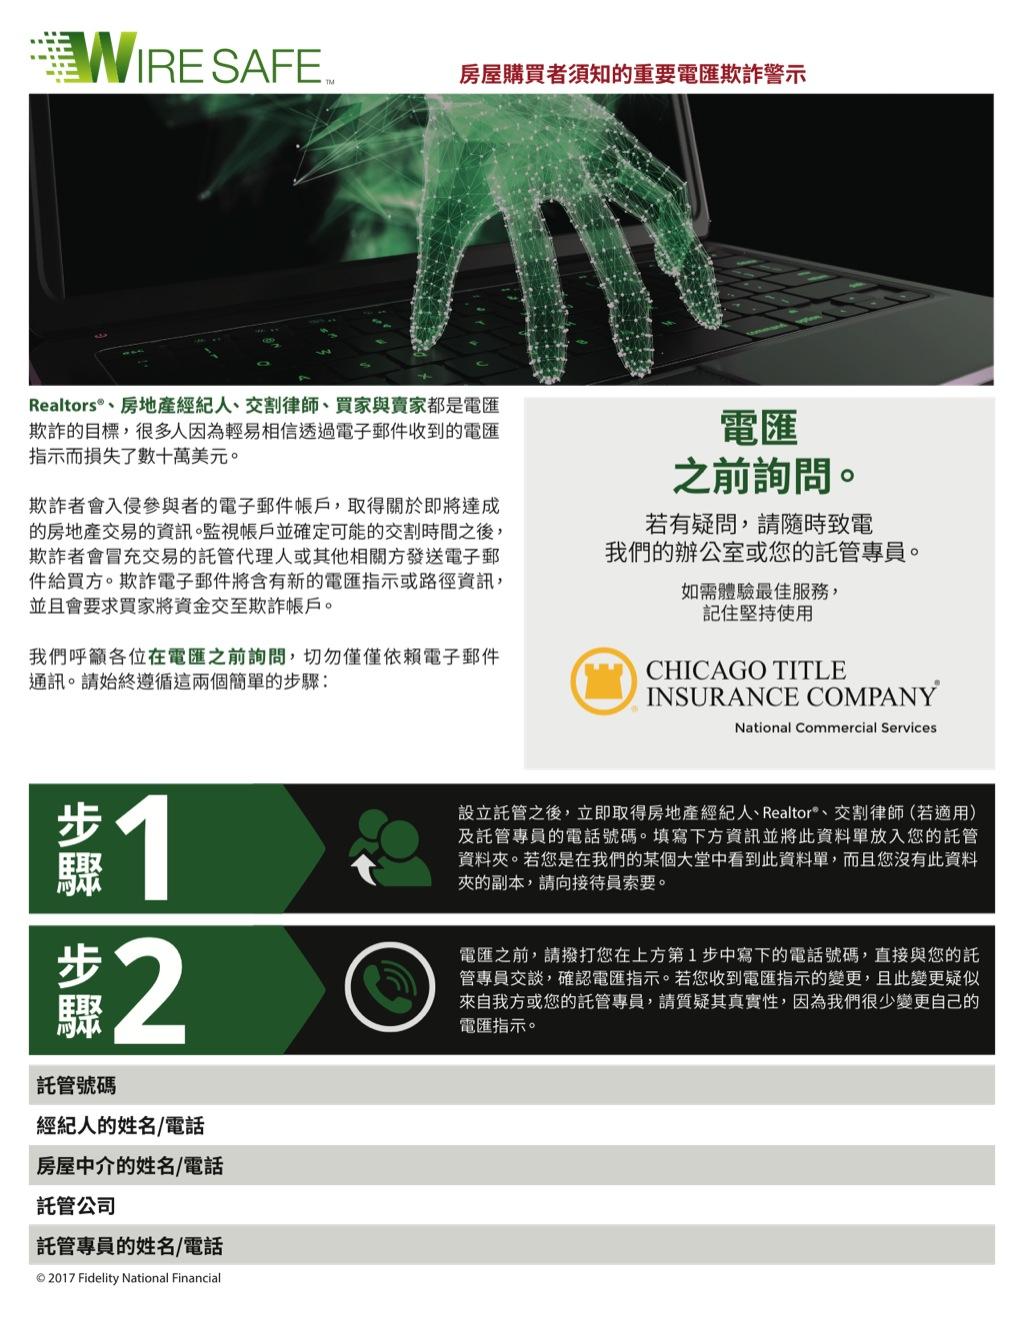 Corefact Wire Safe Buyer Flyer - Cantonese - CTIC NCS